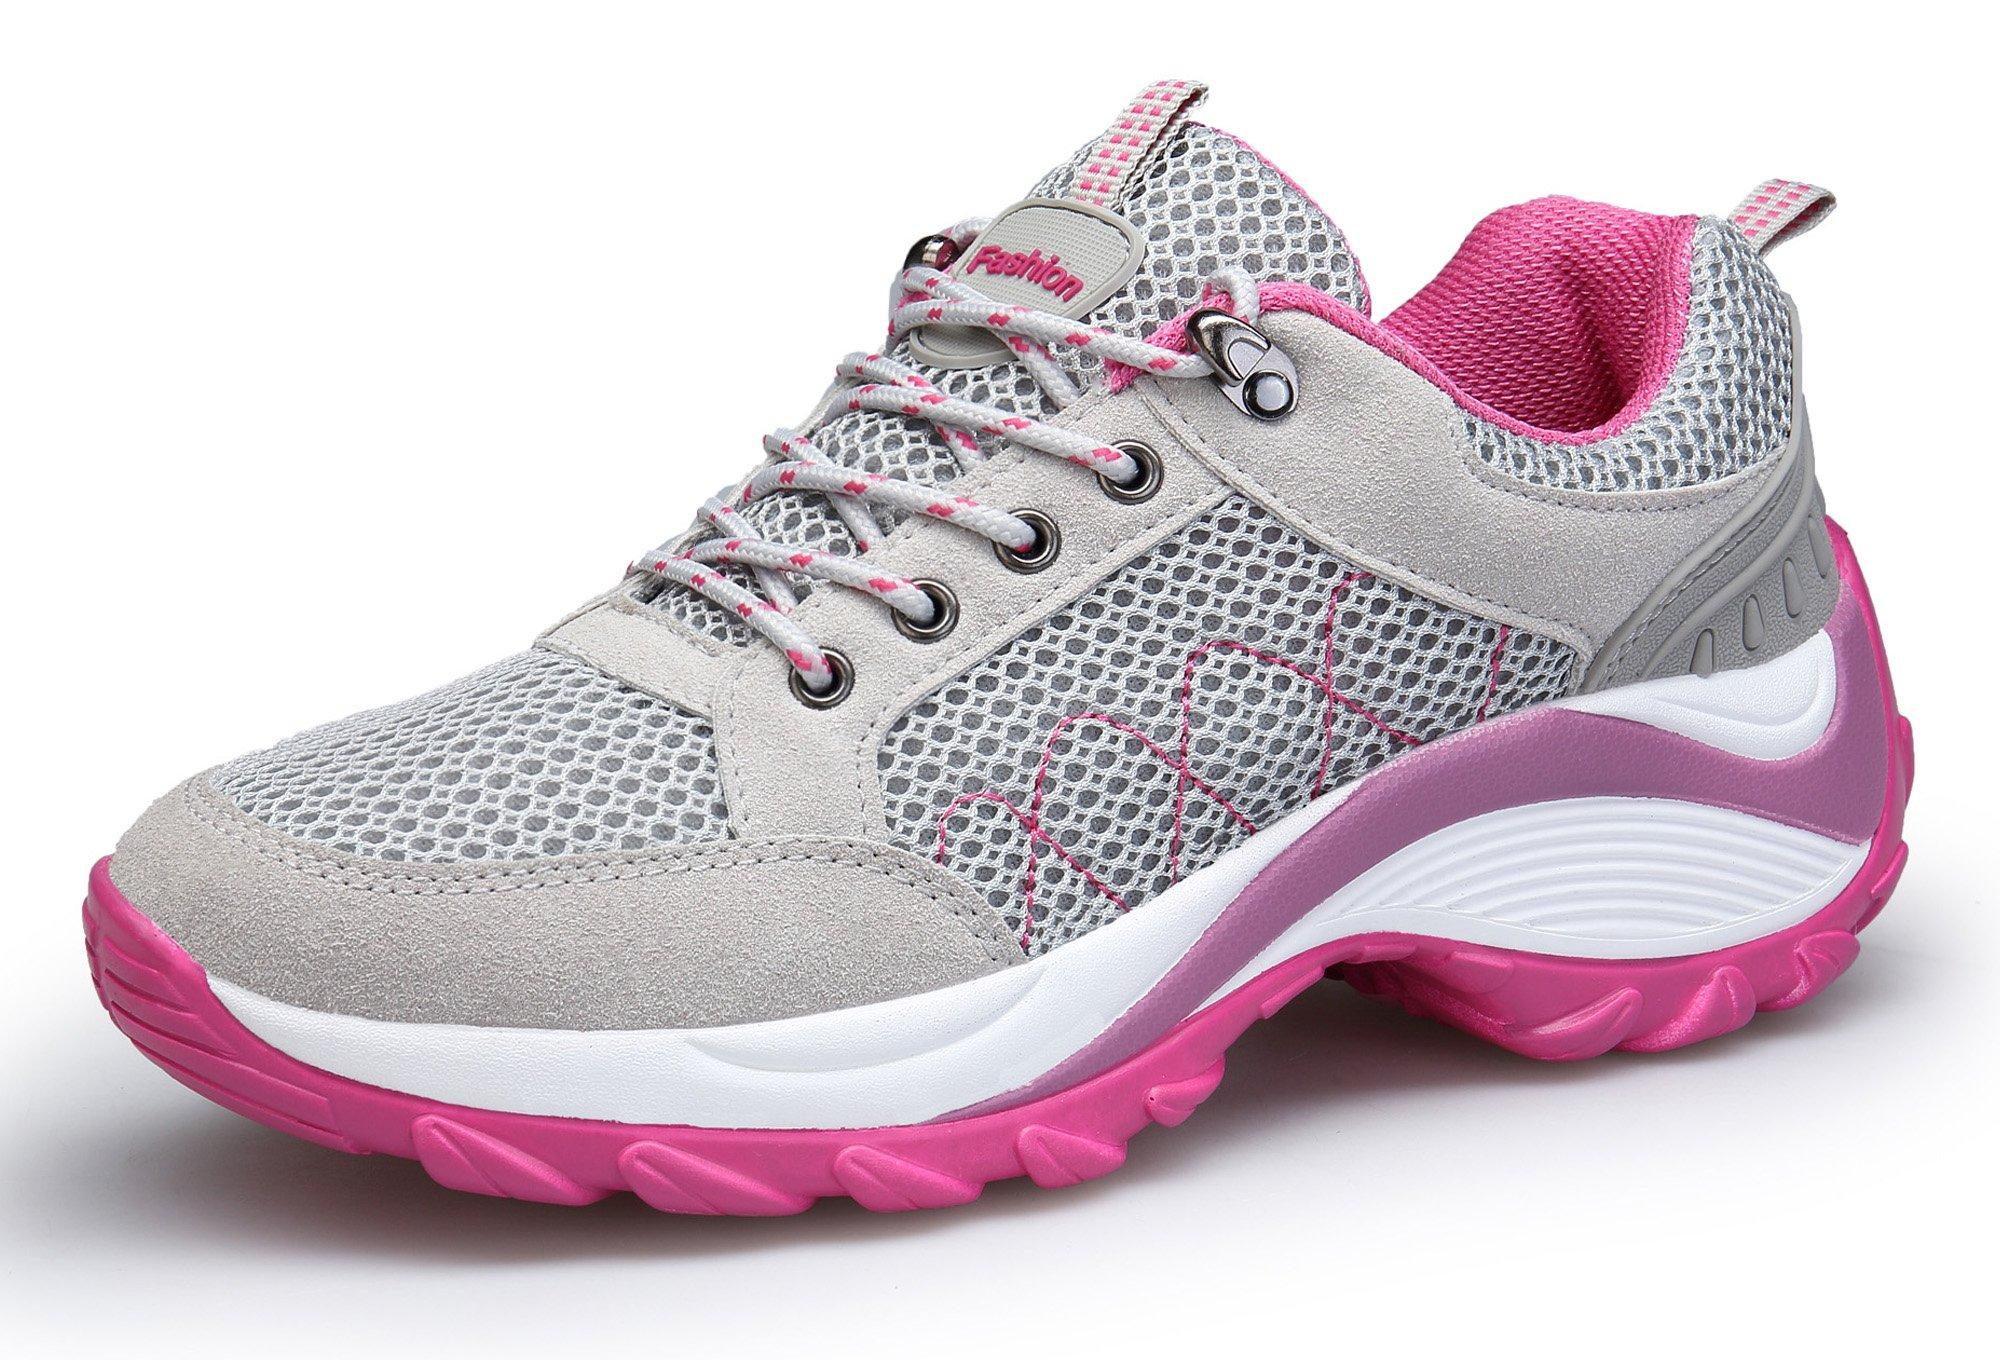 2ee9c8997f22f8 KOUDYEN Scarpe da Ginnastica Donna Sportive Scarpe da Corsa Running  Palestra Sneakers